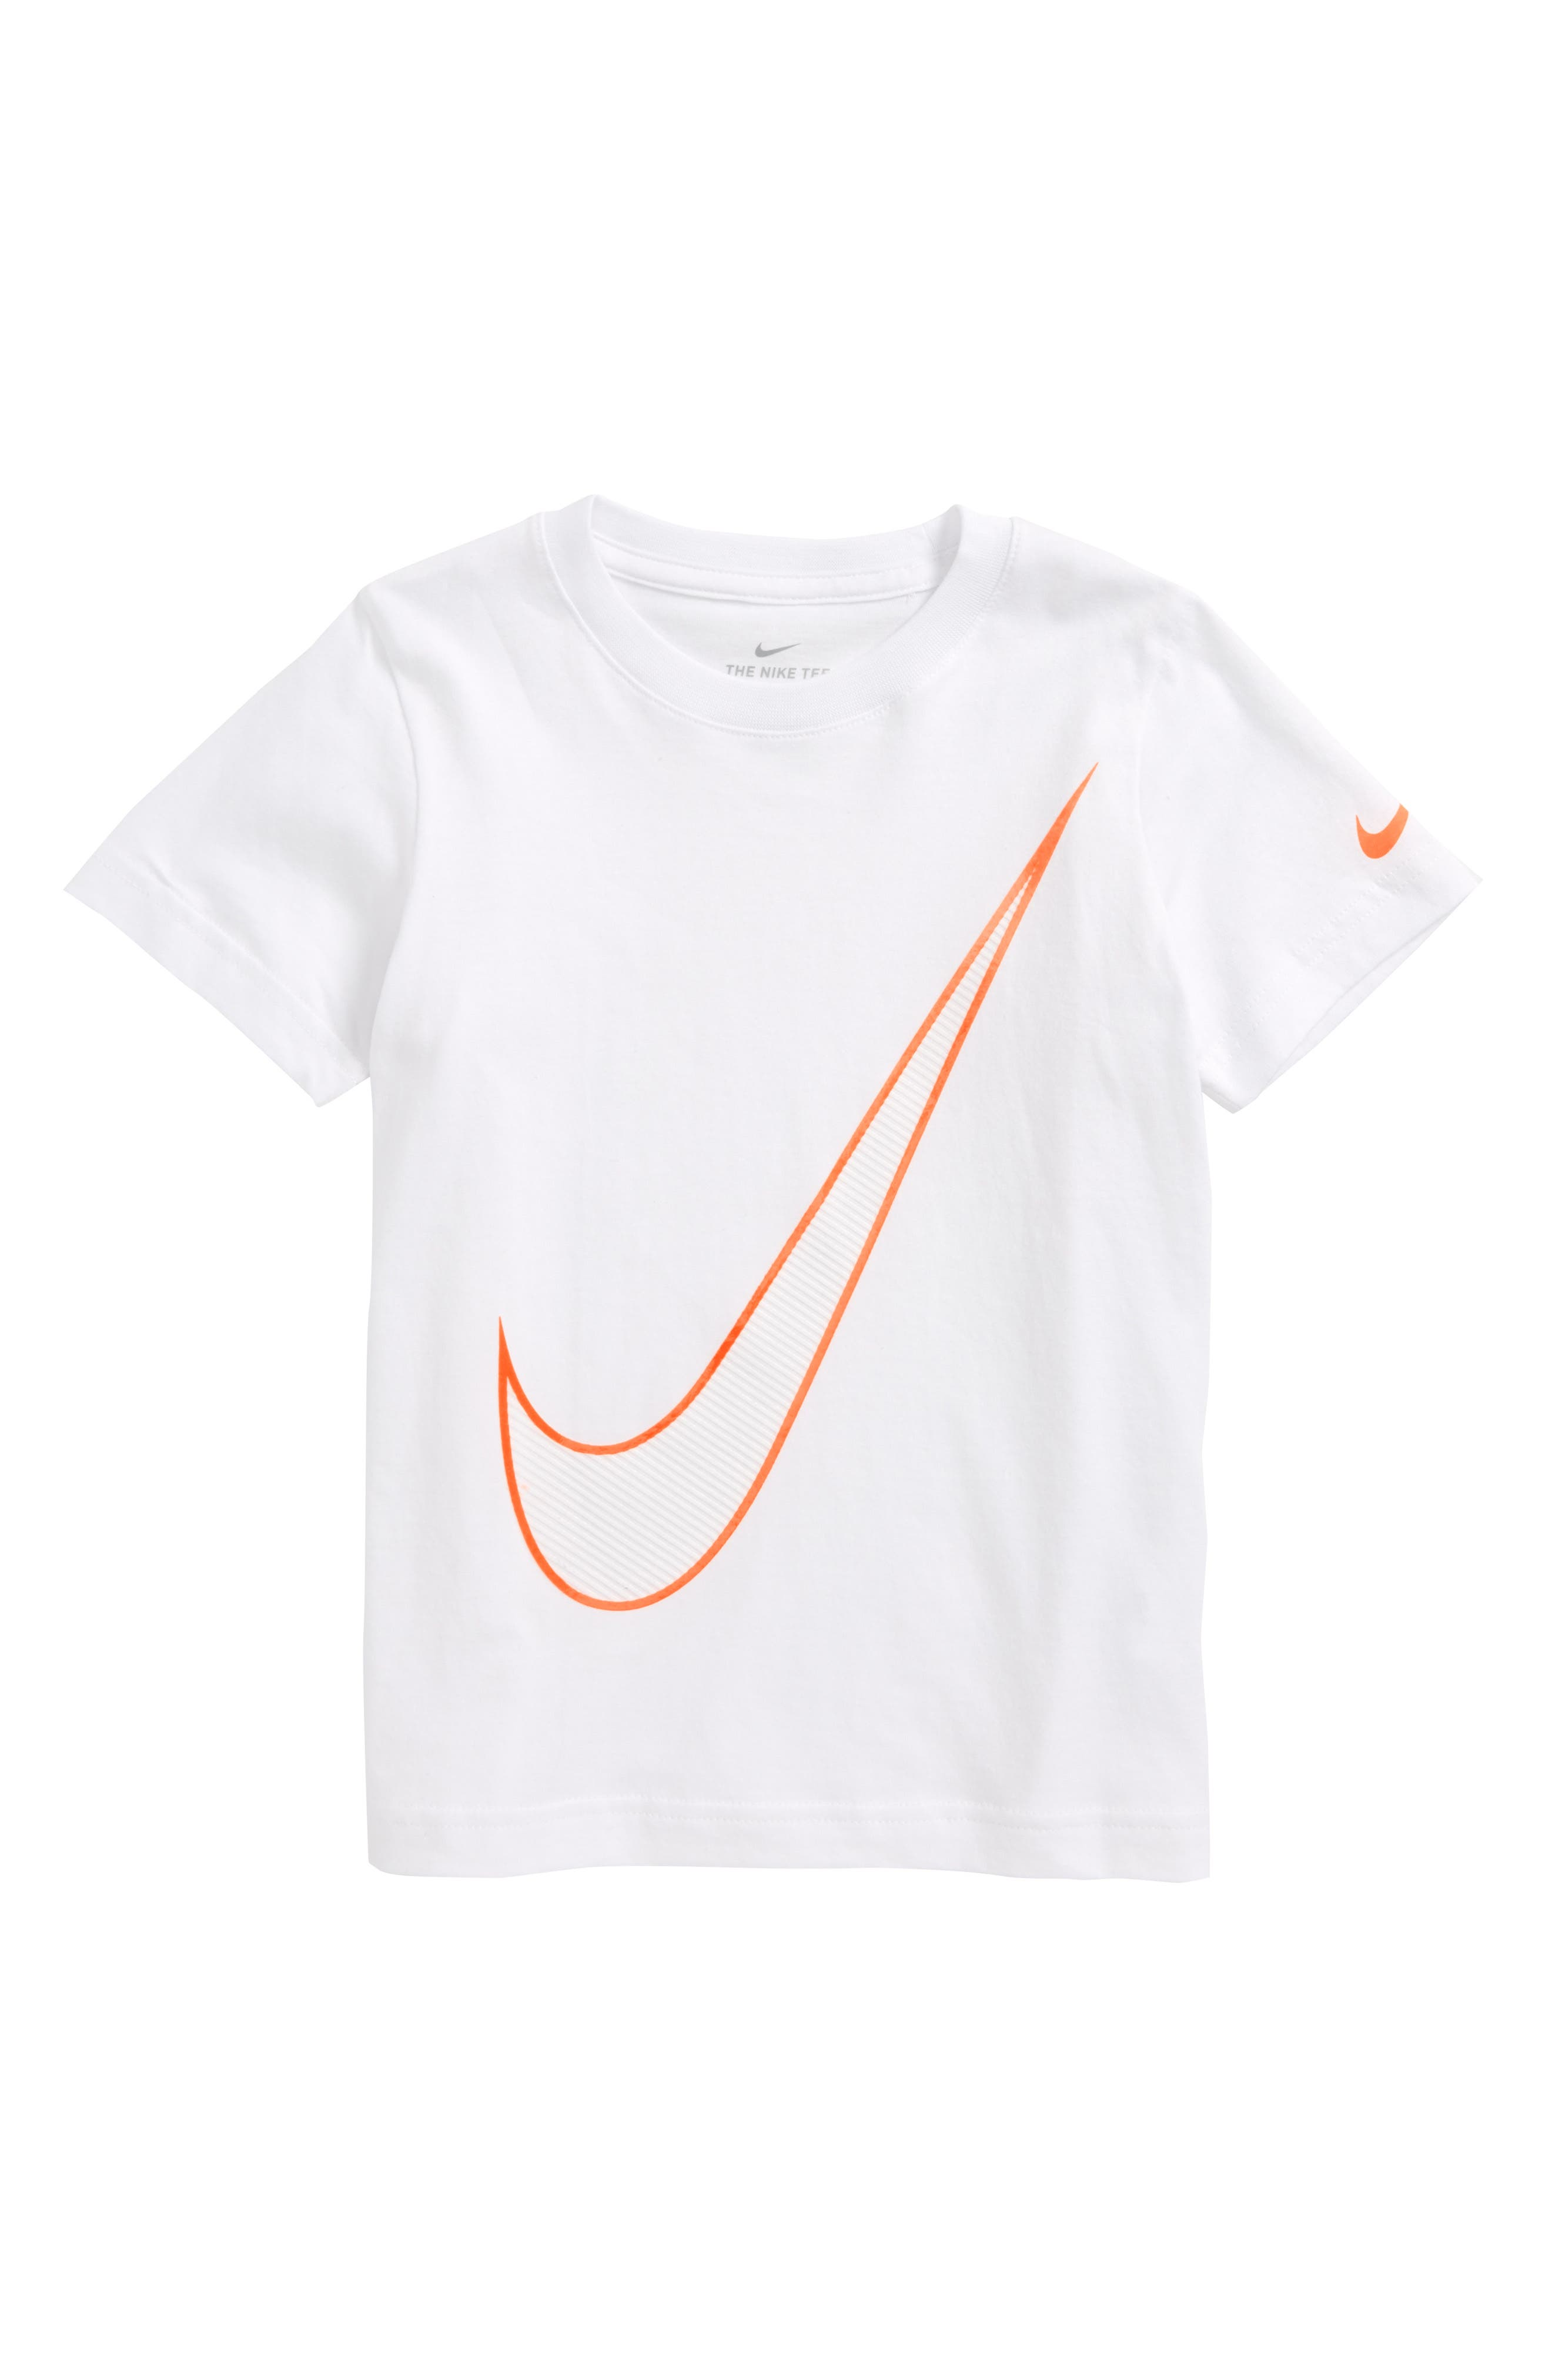 Alternate Image 1 Selected - Nike Oversize Swoosh Graphic T-Shirt (Toddler Boys & Little Boys)